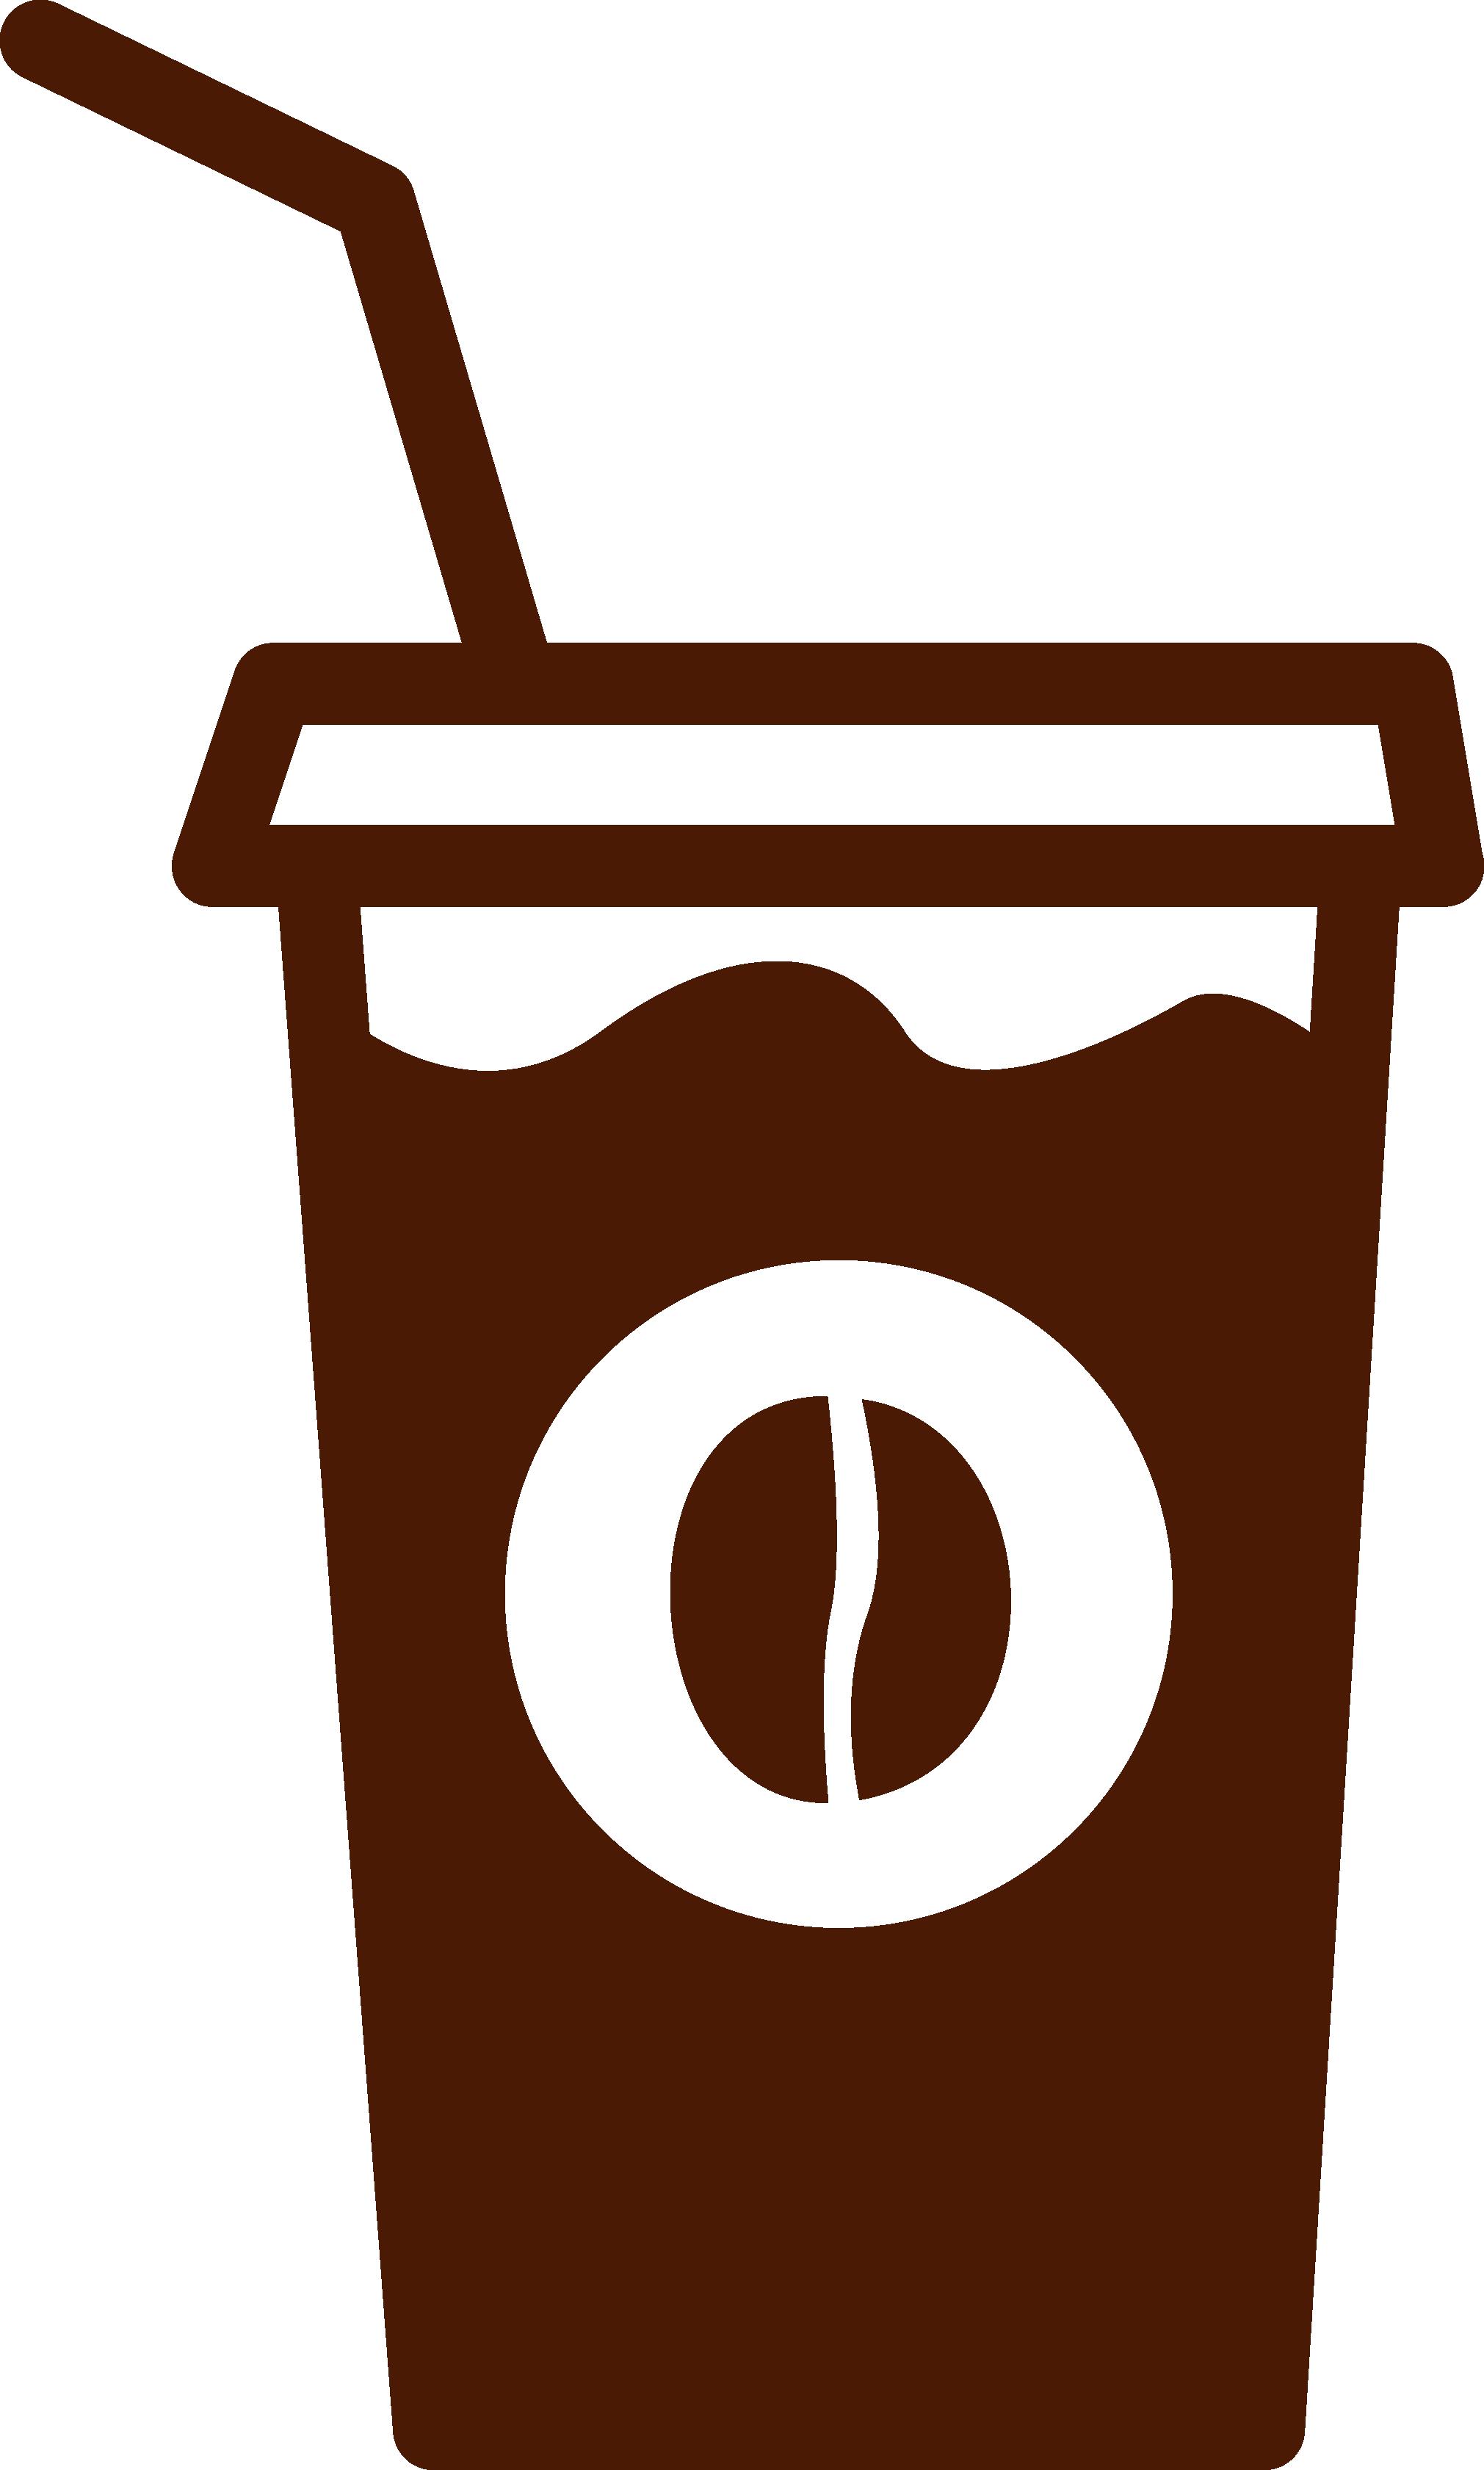 Clipart coffee iced coffee. Cappuccino latte espresso takeout